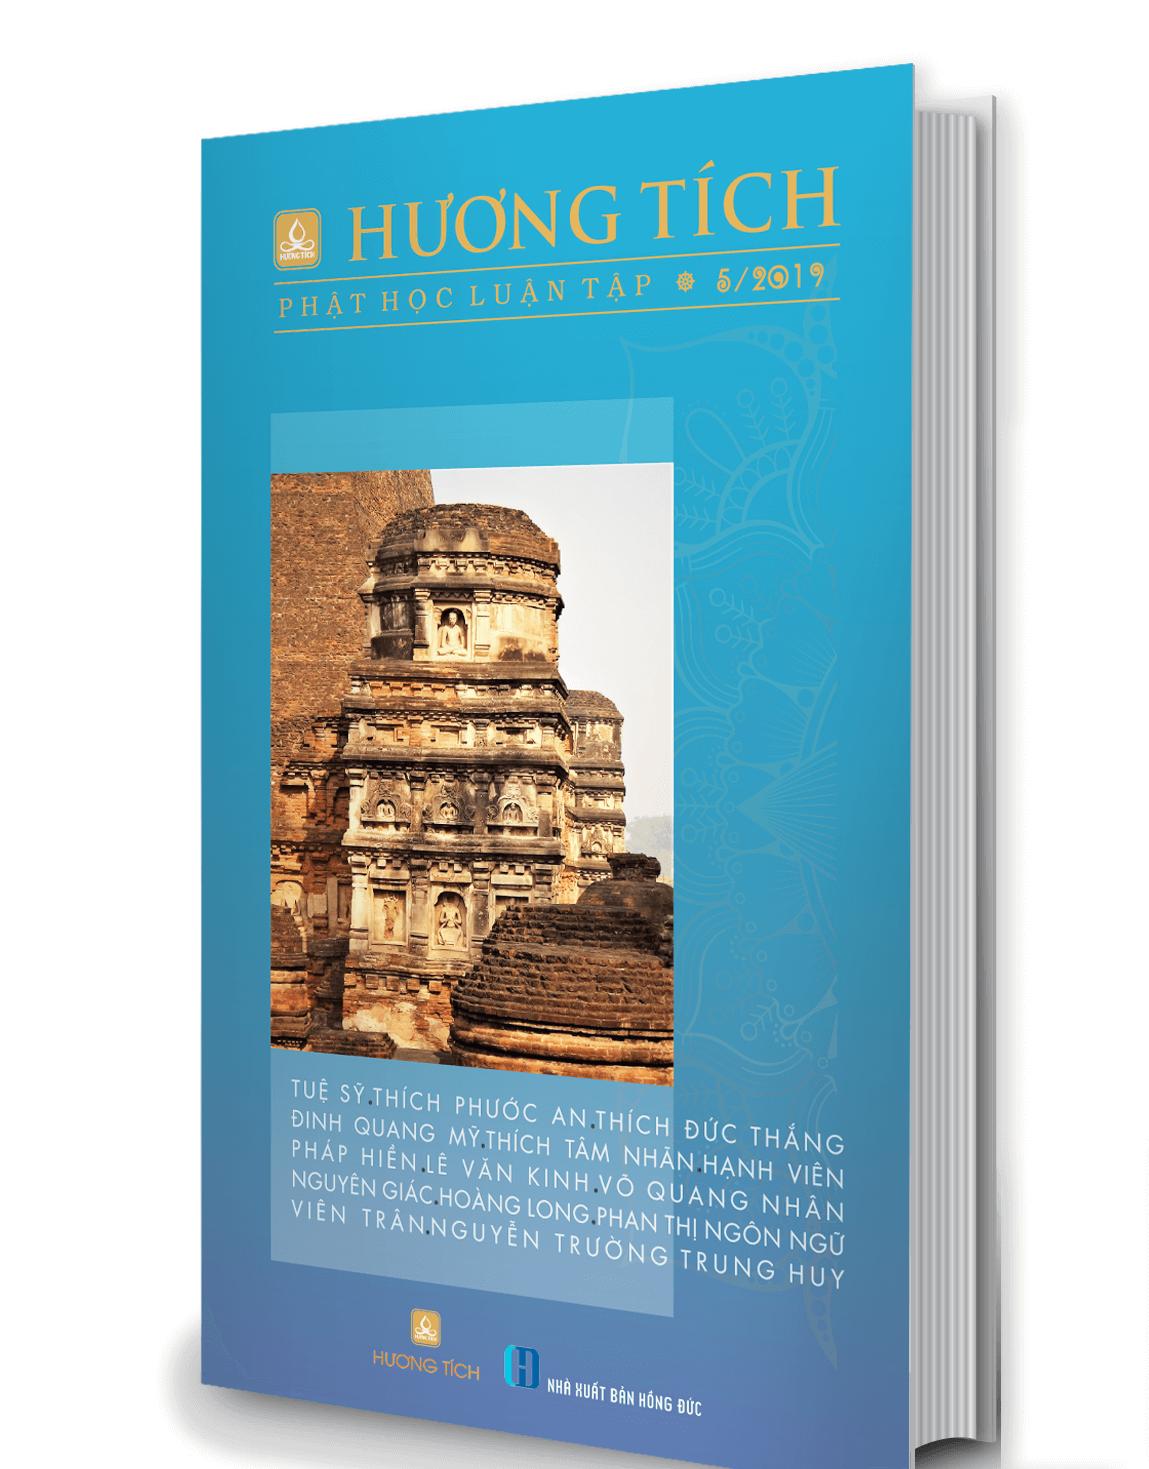 Phật Học Luận Tập, tập 5 - 01/2019